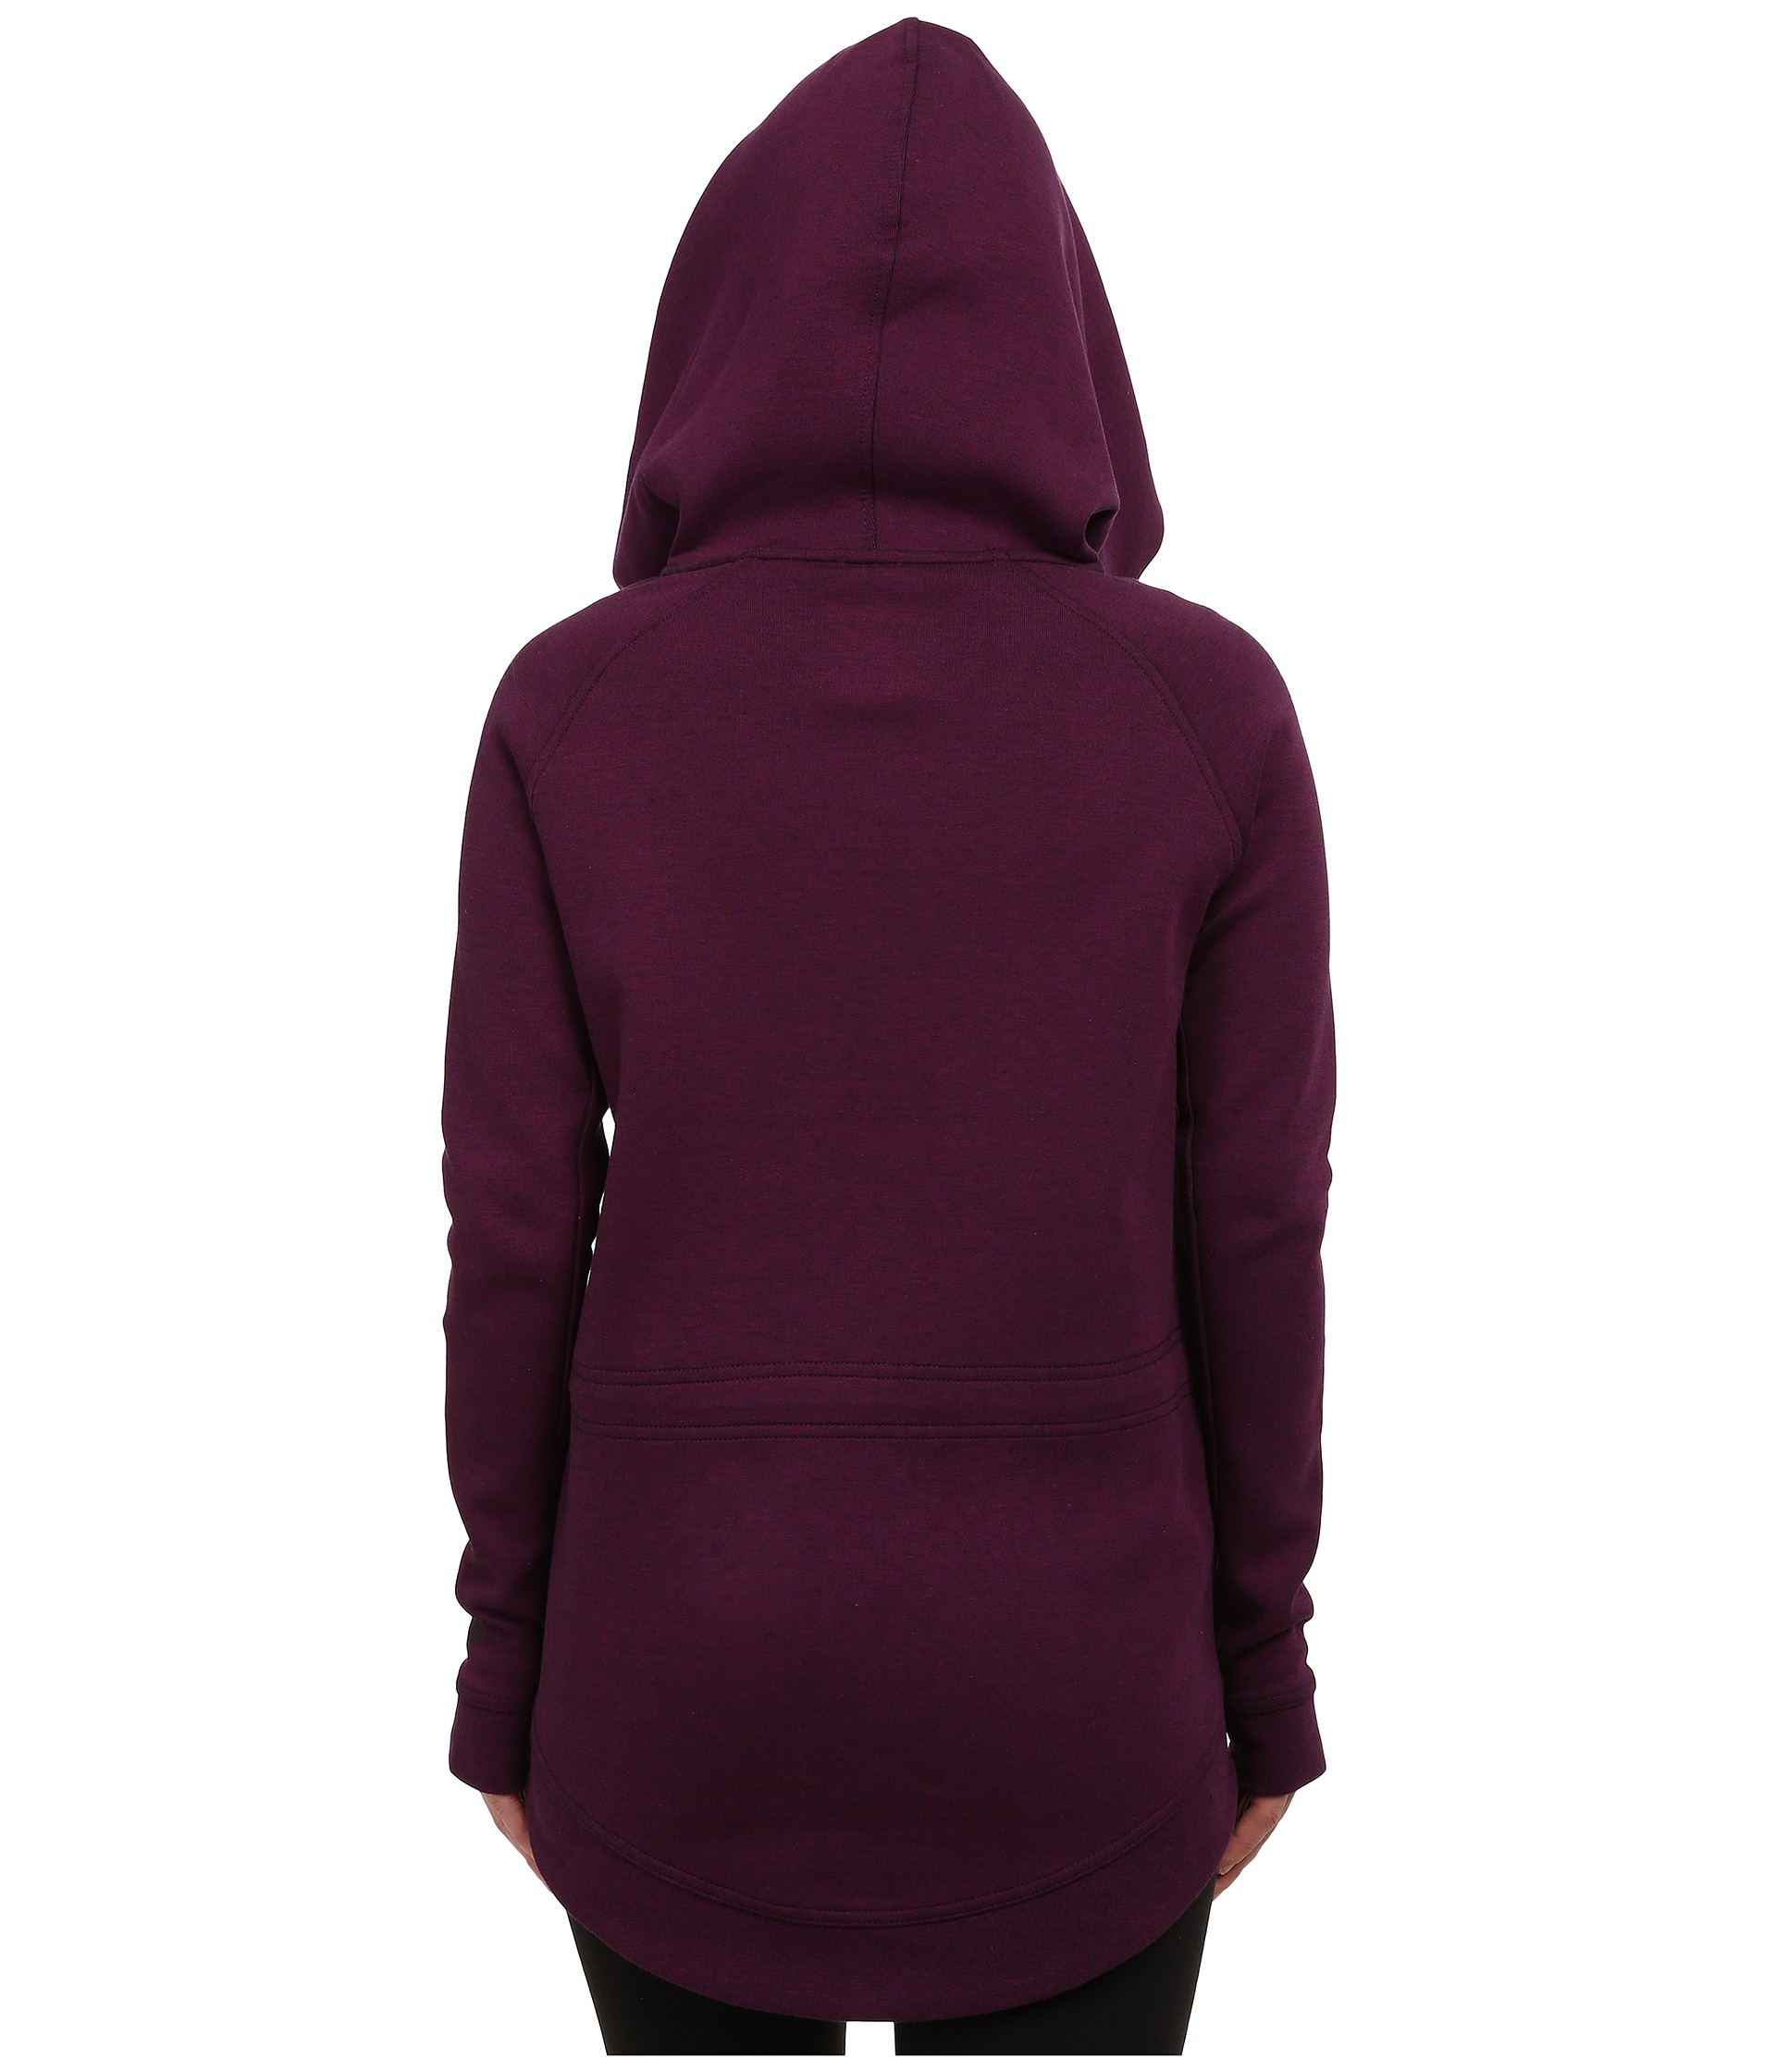 lyst nike tech fleece cape in purple. Black Bedroom Furniture Sets. Home Design Ideas